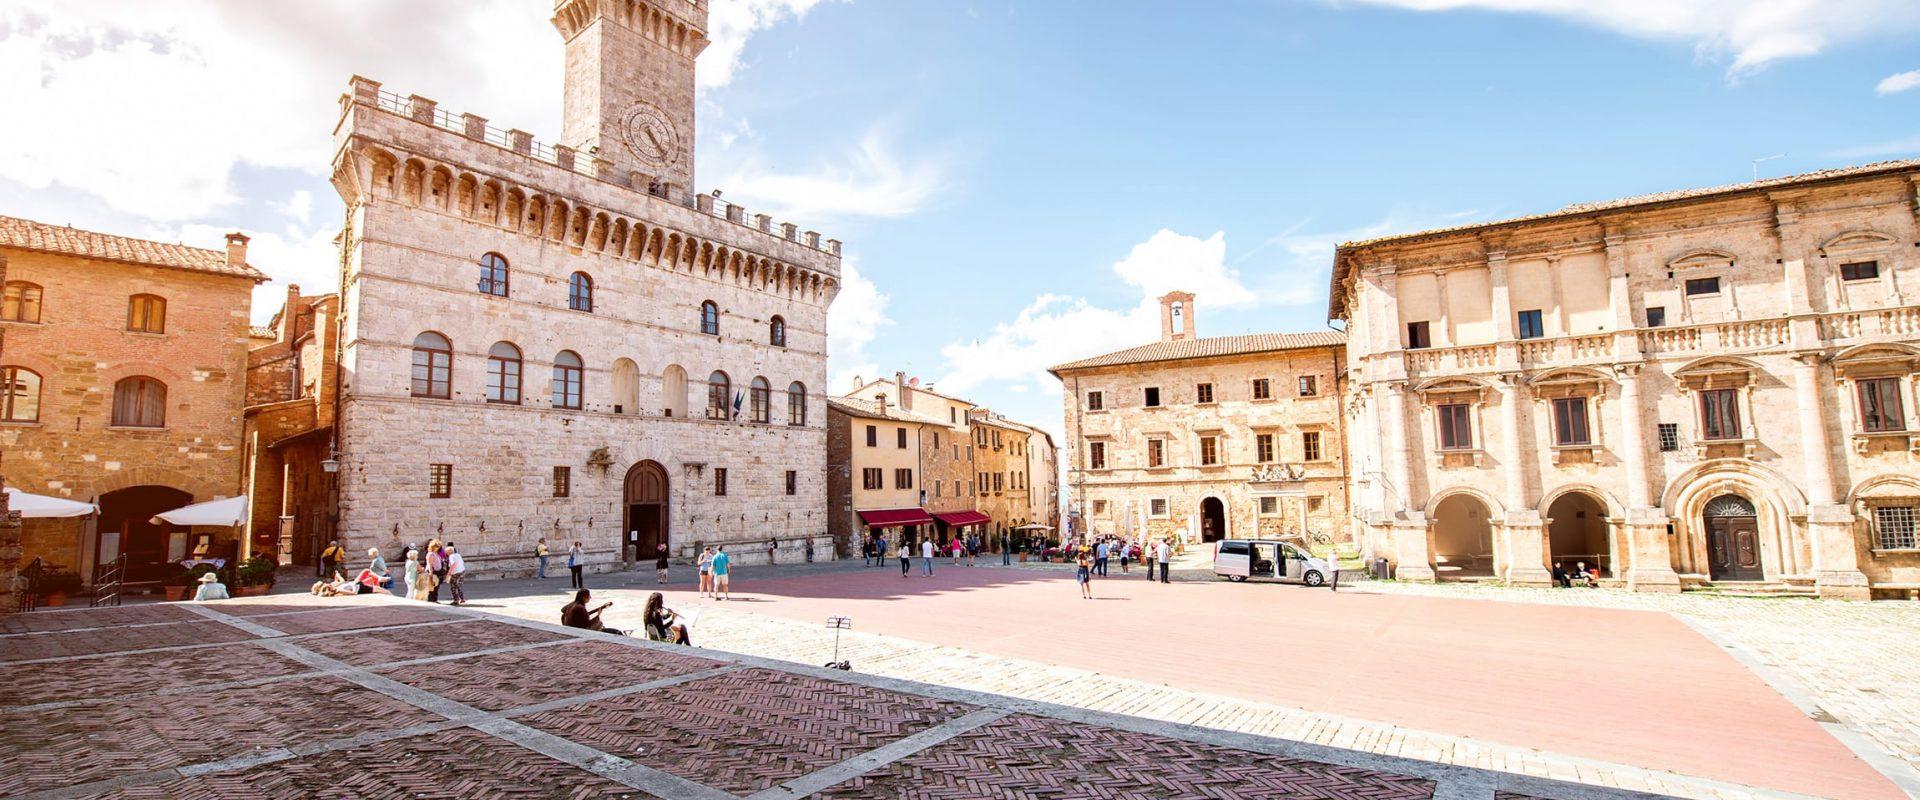 Assi4 | Filiale di Montepulciano